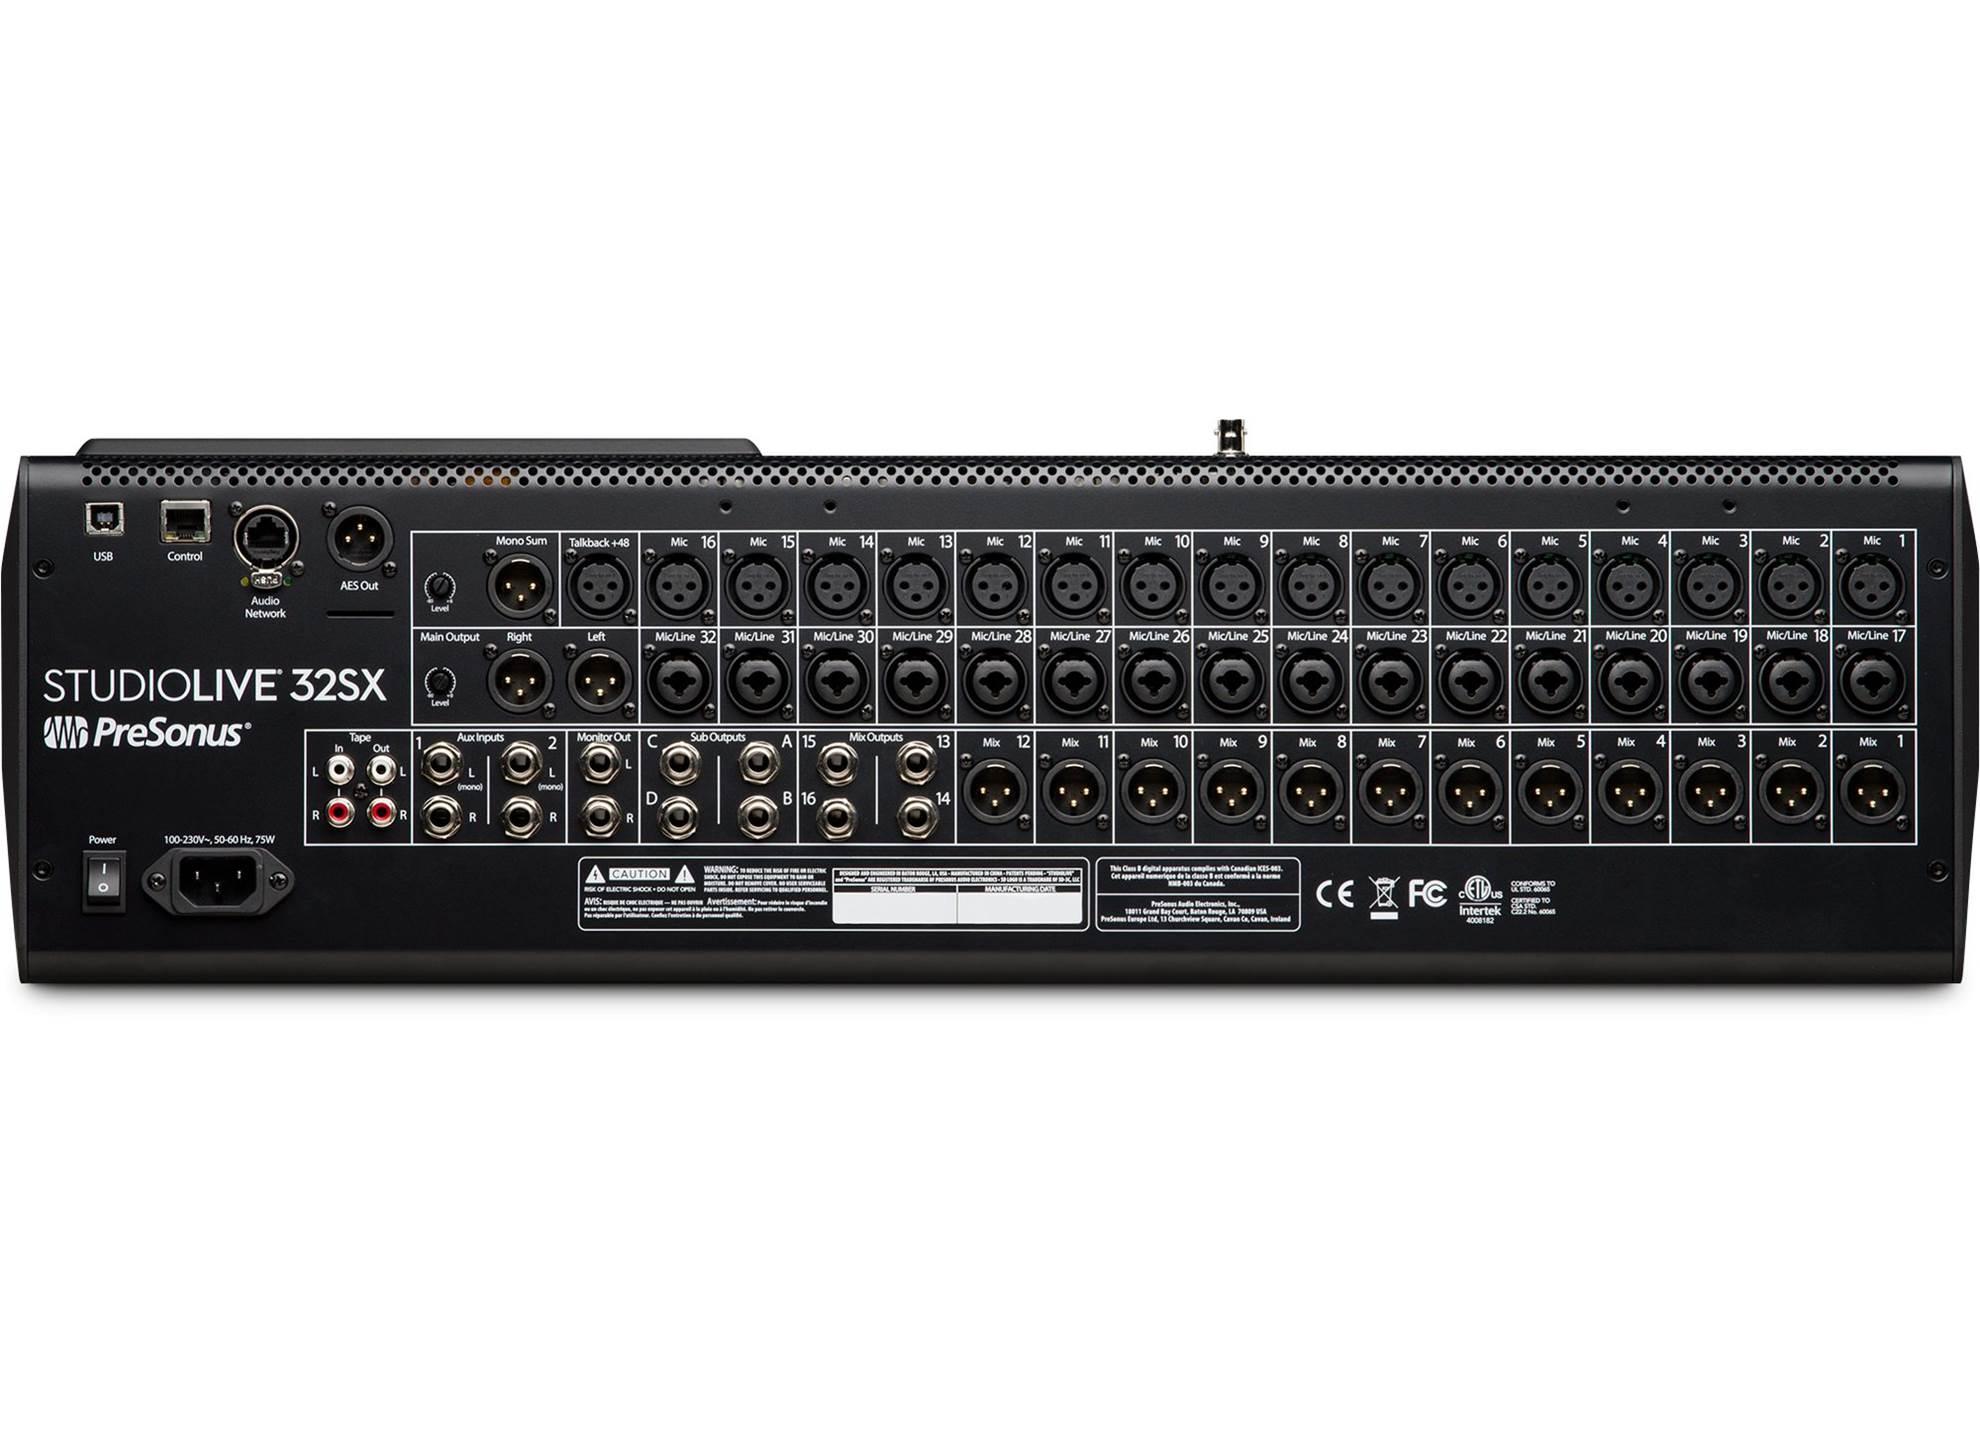 StudioLive 32SX